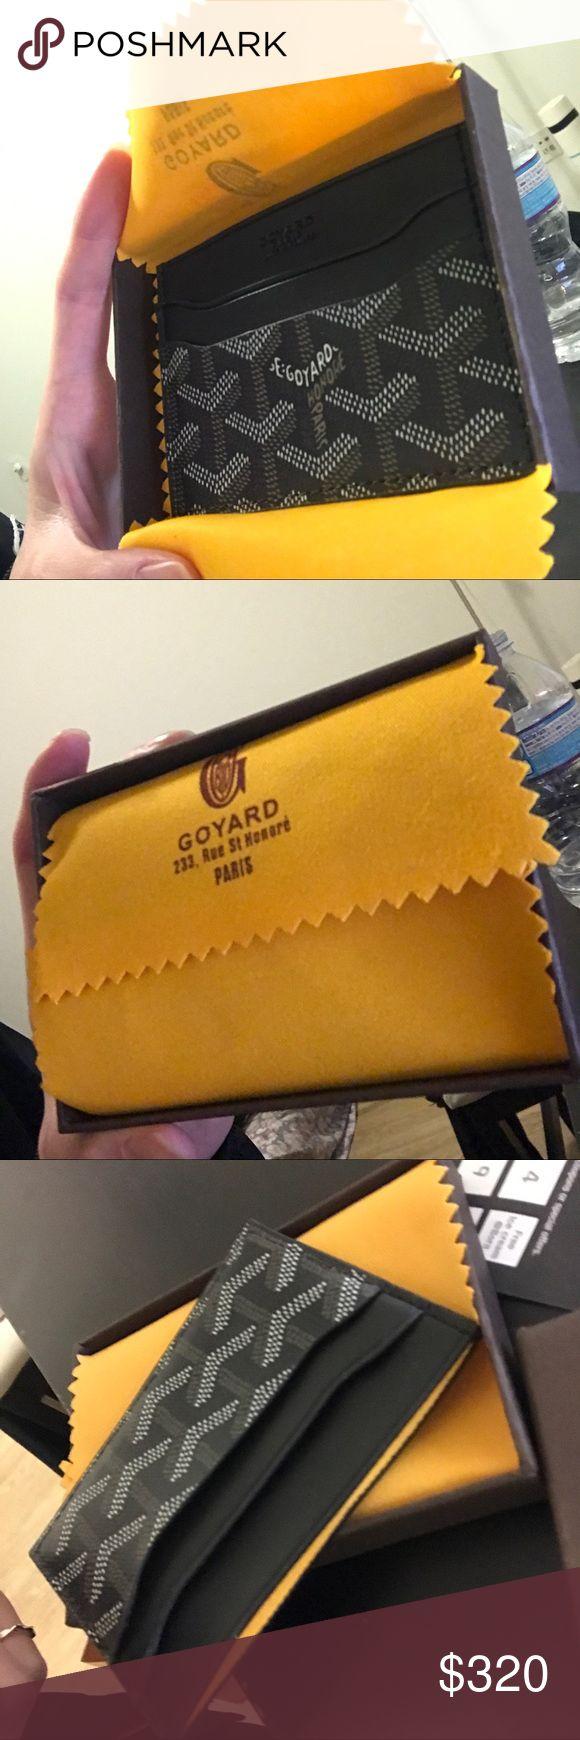 Goyard Card Holder Goyard card holder, never used. Black. With box. Auth. Make me an offer! Goyard Bags Wallets